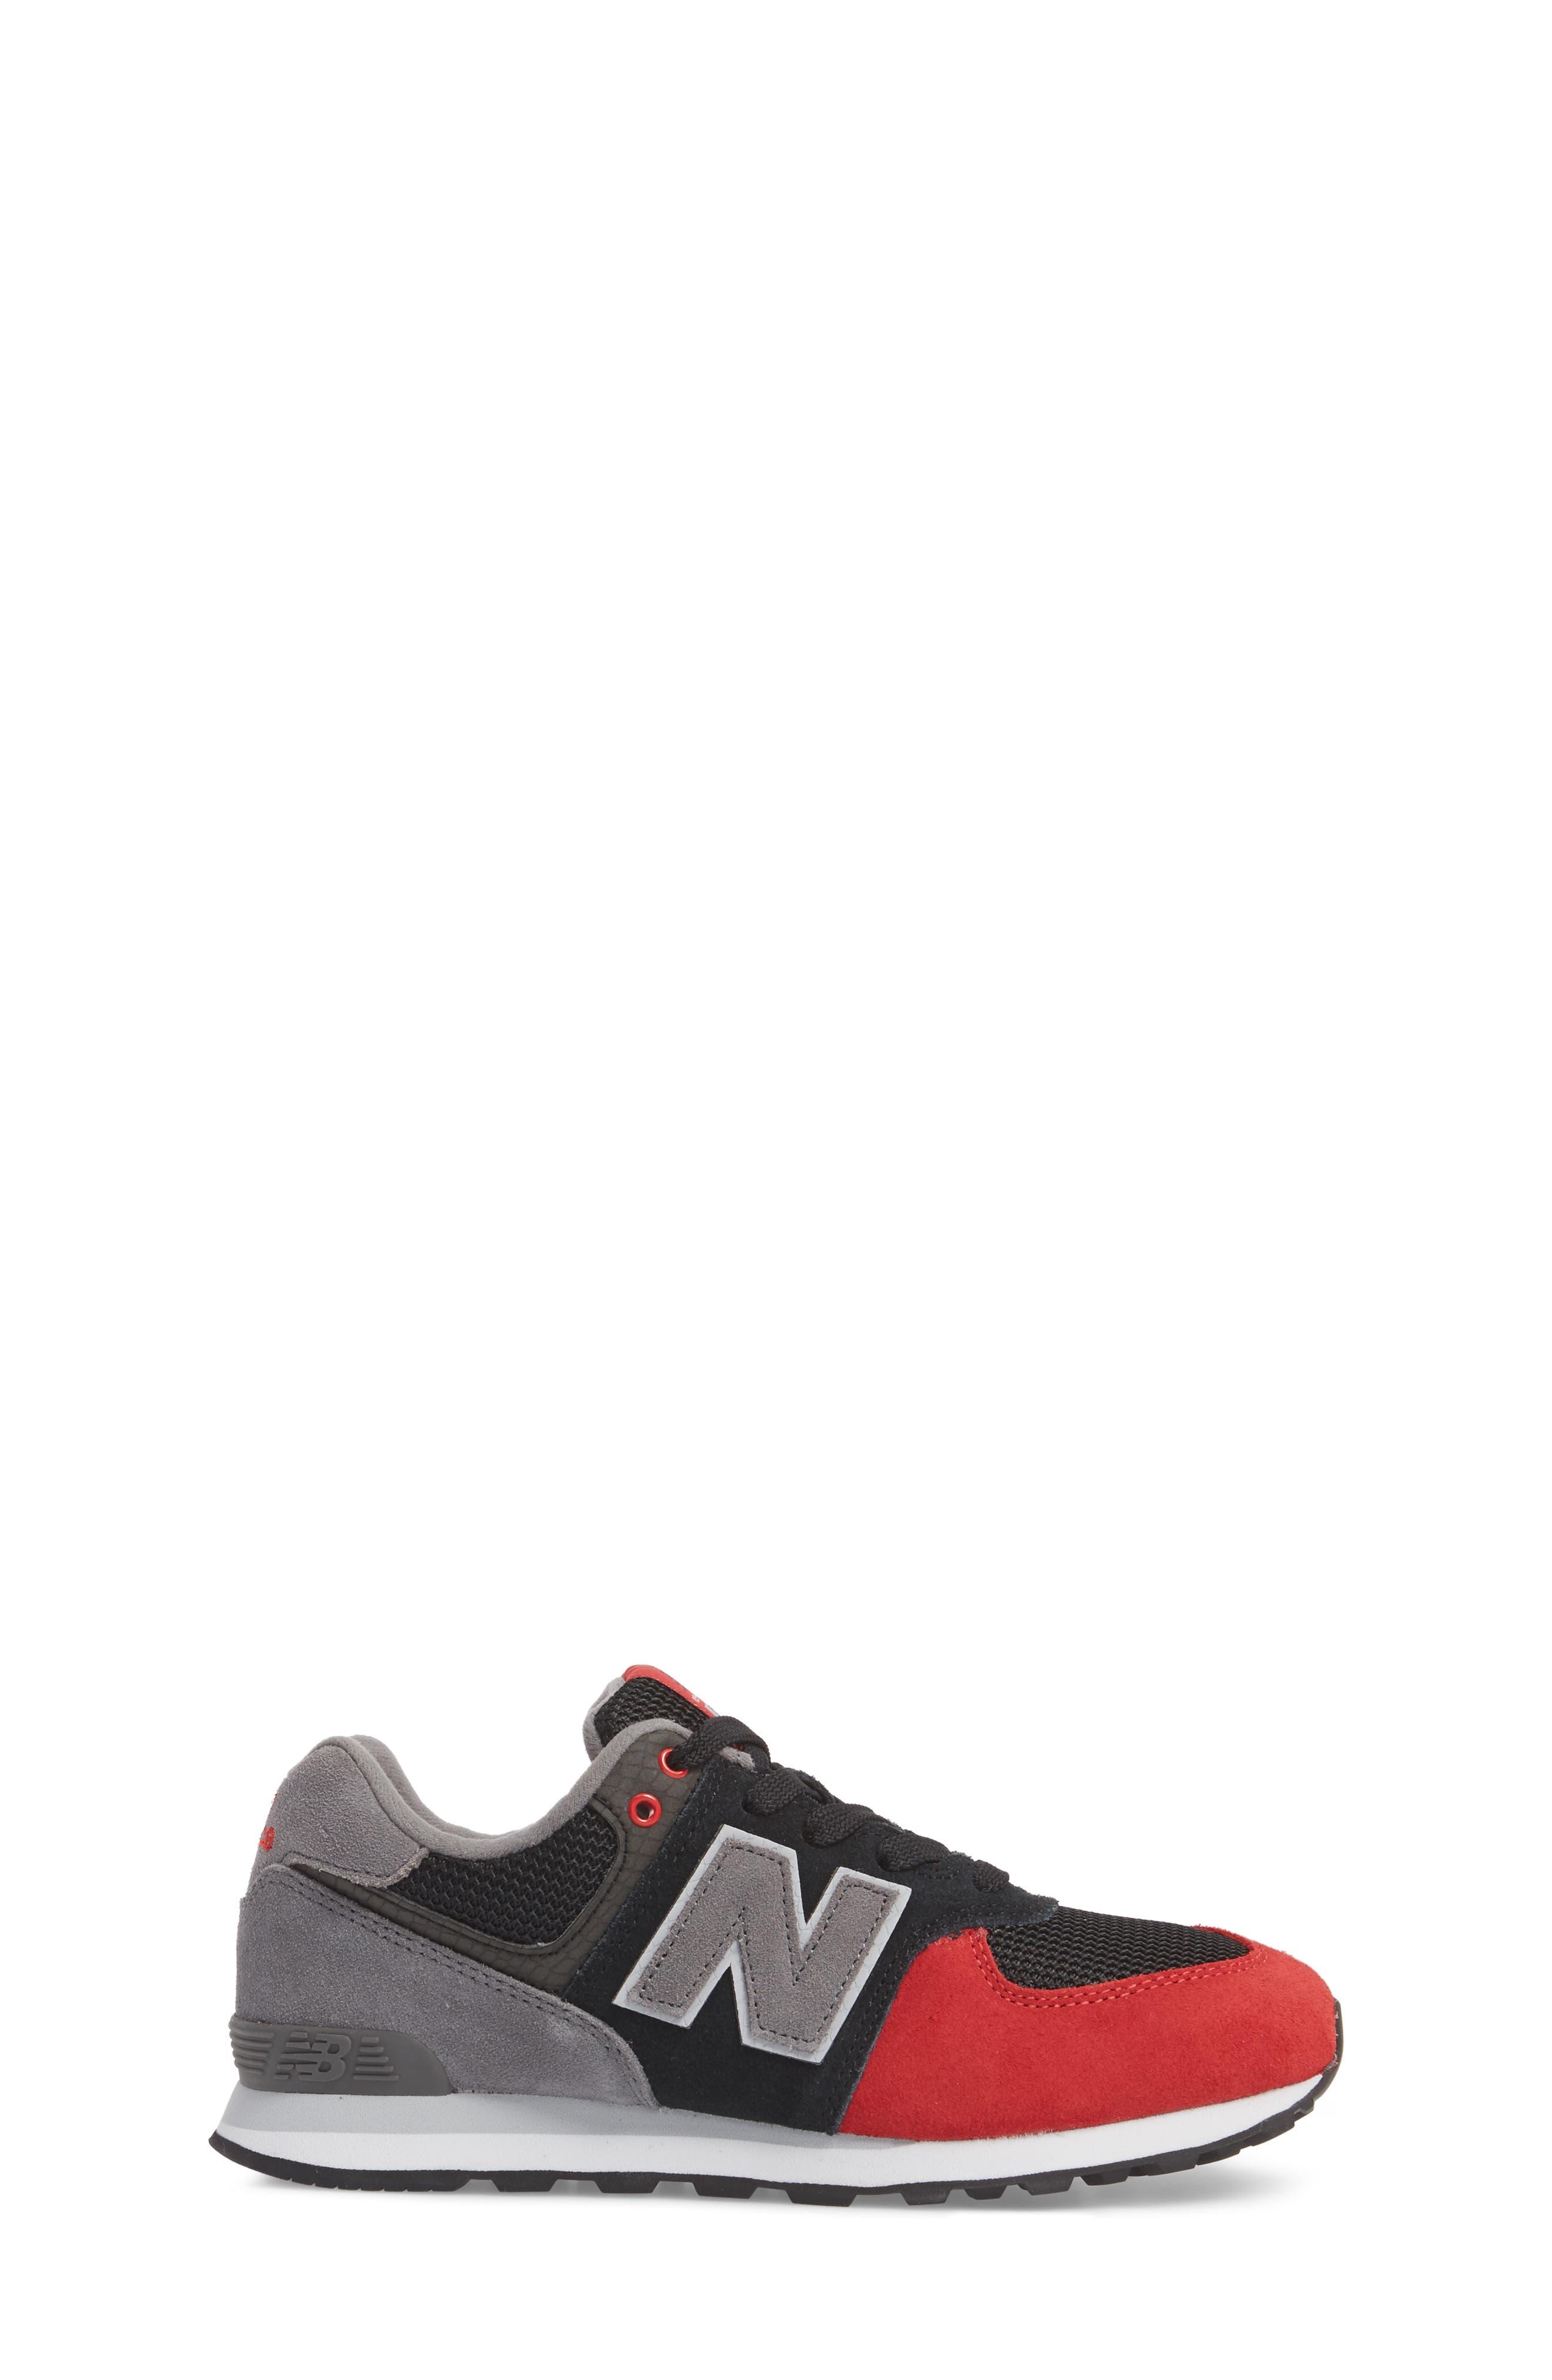 574 Serpent Luxe Sneaker,                             Alternate thumbnail 5, color,